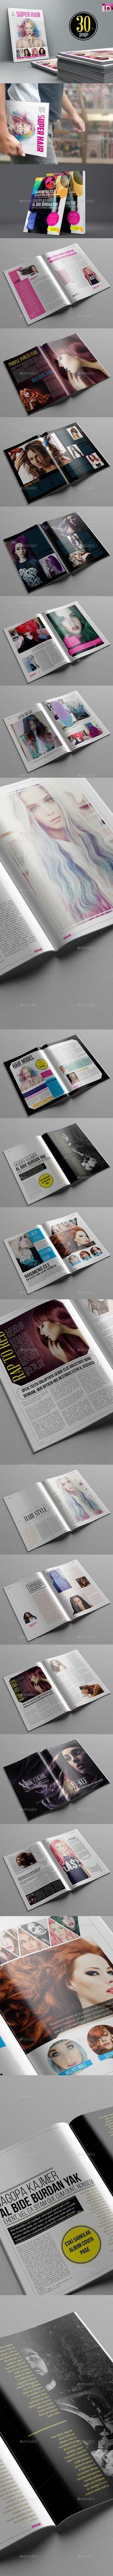 Super Hair Magazine Template #design #journal Download: http://graphicriver.net/item/super-hair-magazine-template/10985558?ref=ksioks